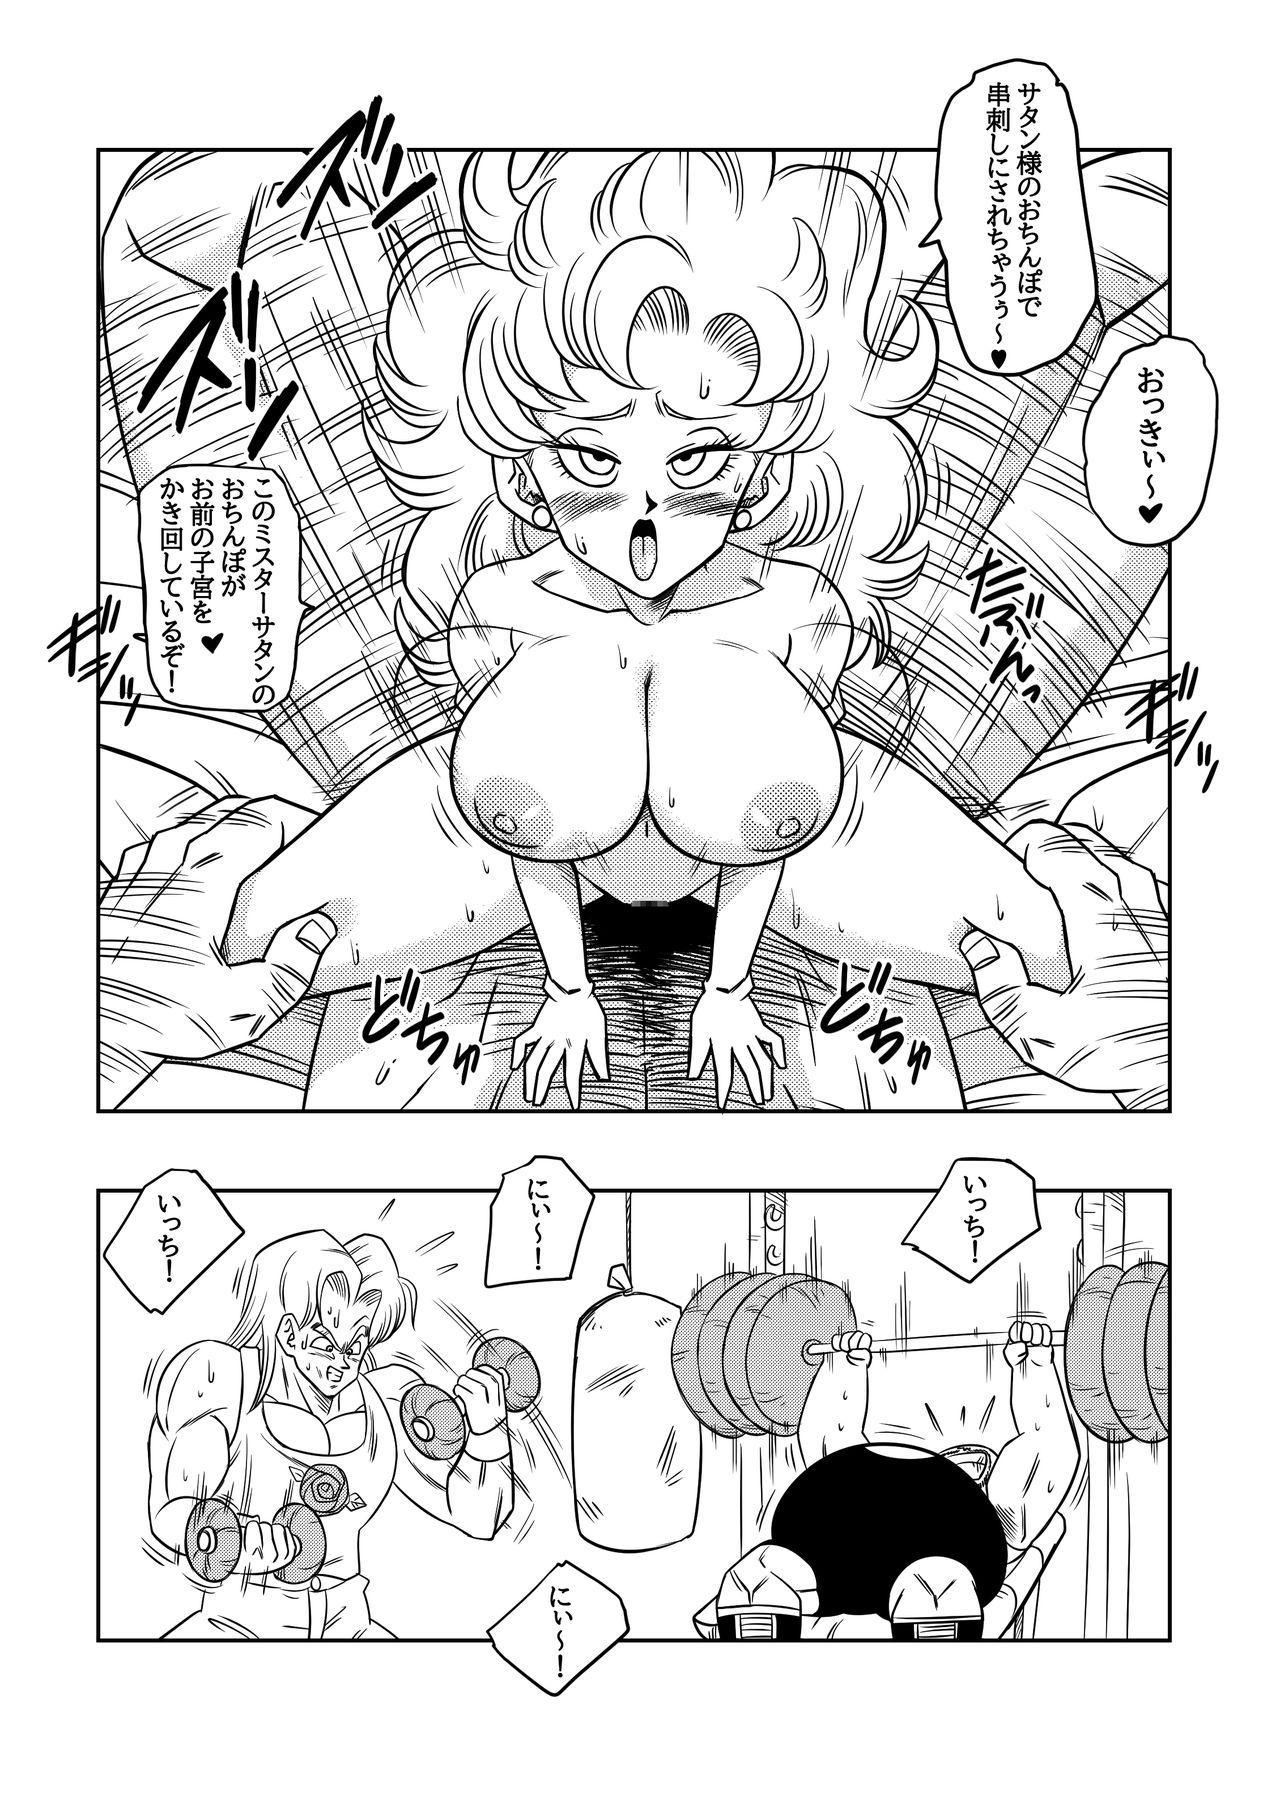 Mister Satan no Himitsu no Training 15